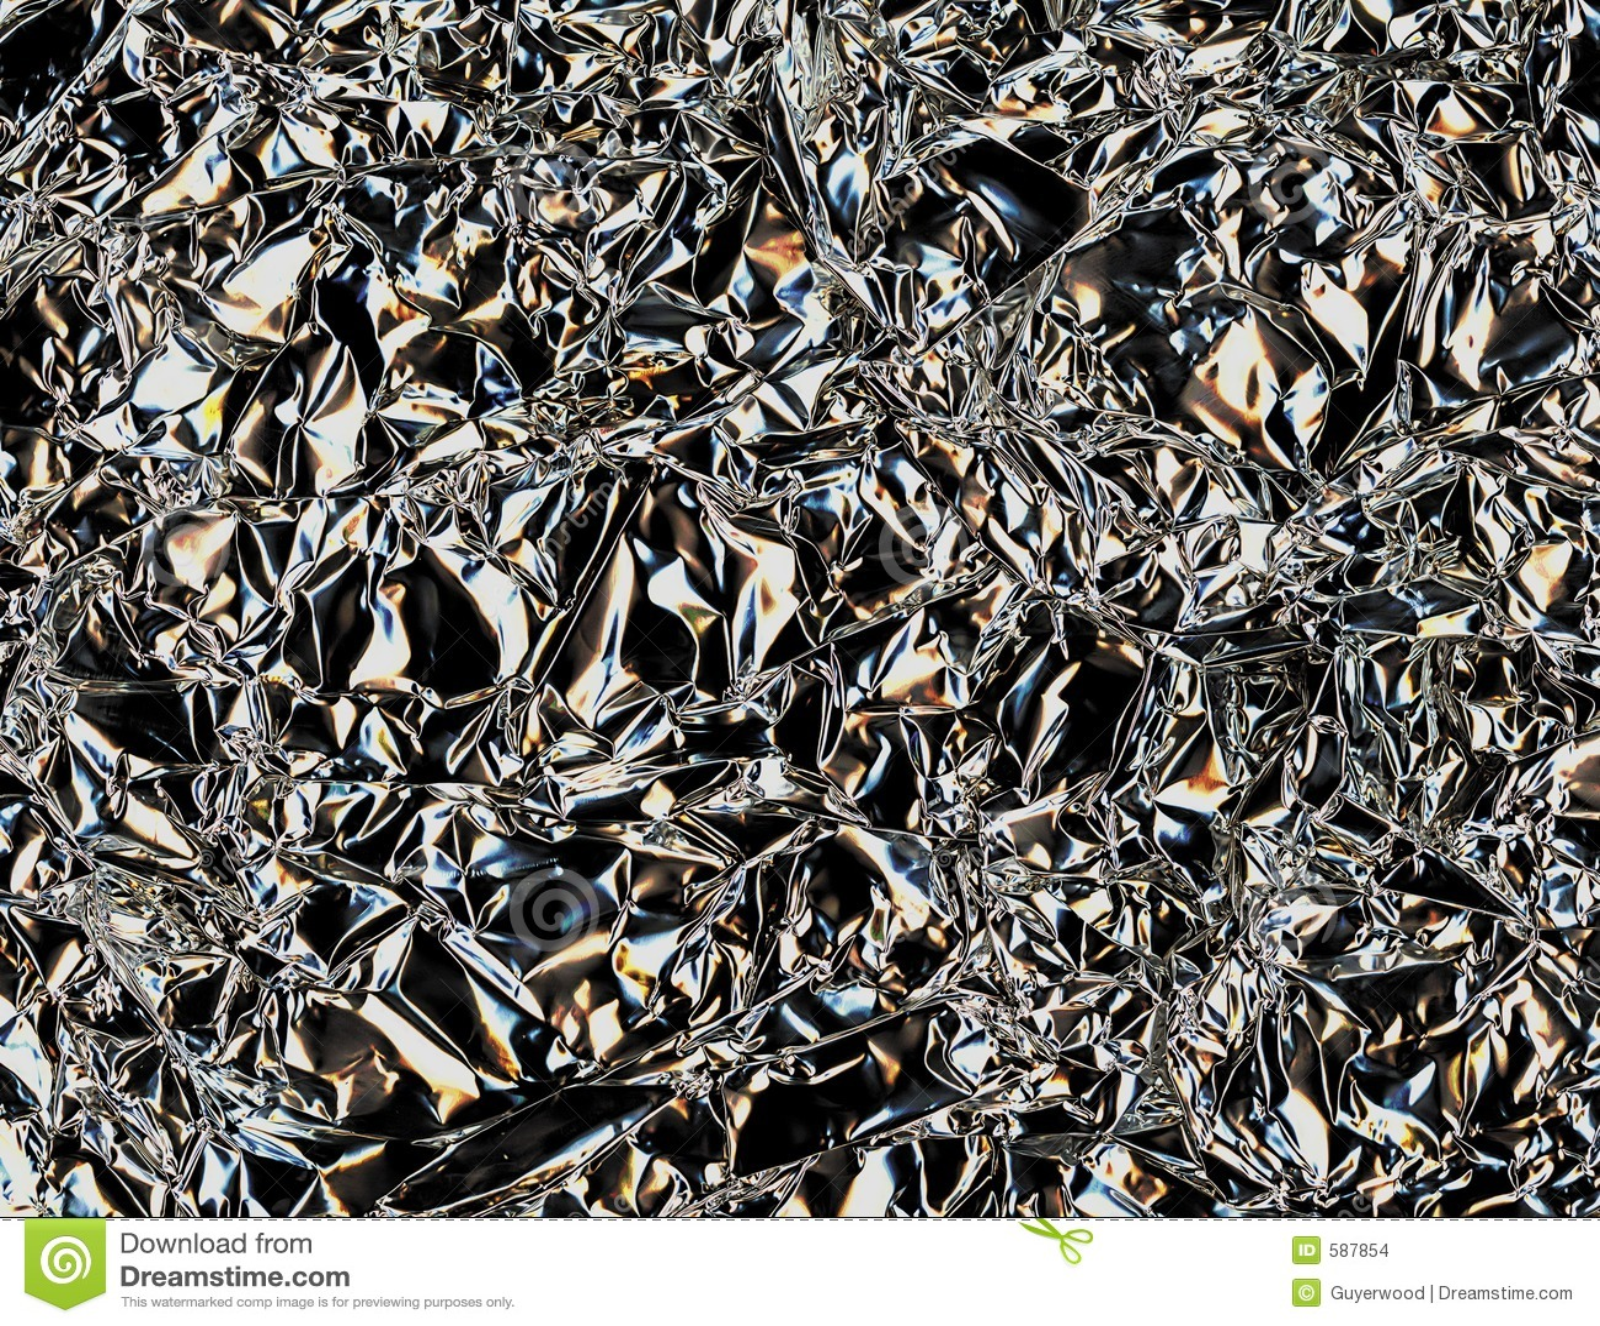 Papel de aluminio arrugado imagenes de archivo imagen for Papel de pared plata